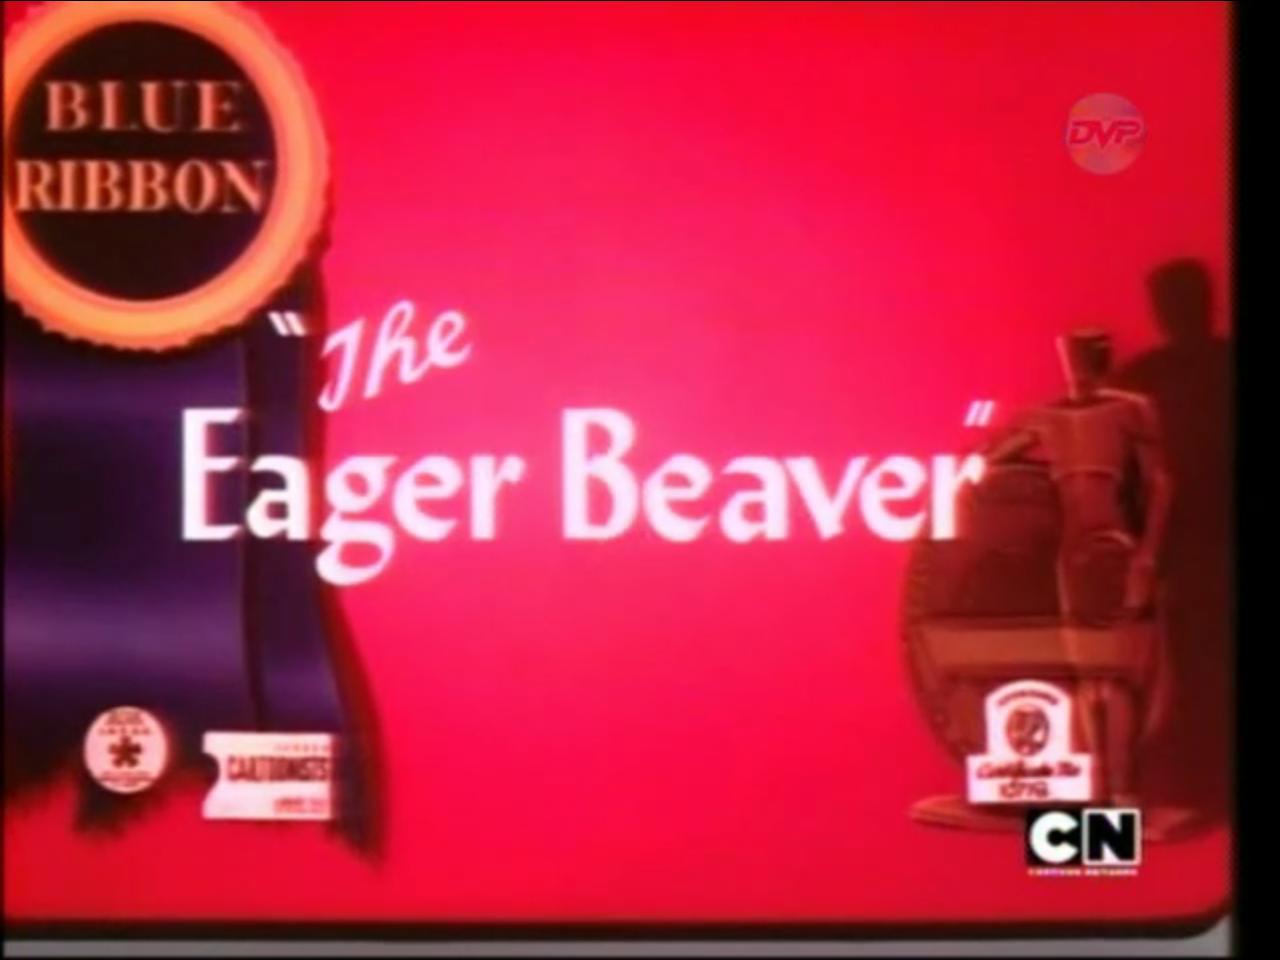 The Egaer Beaver (A.A.P